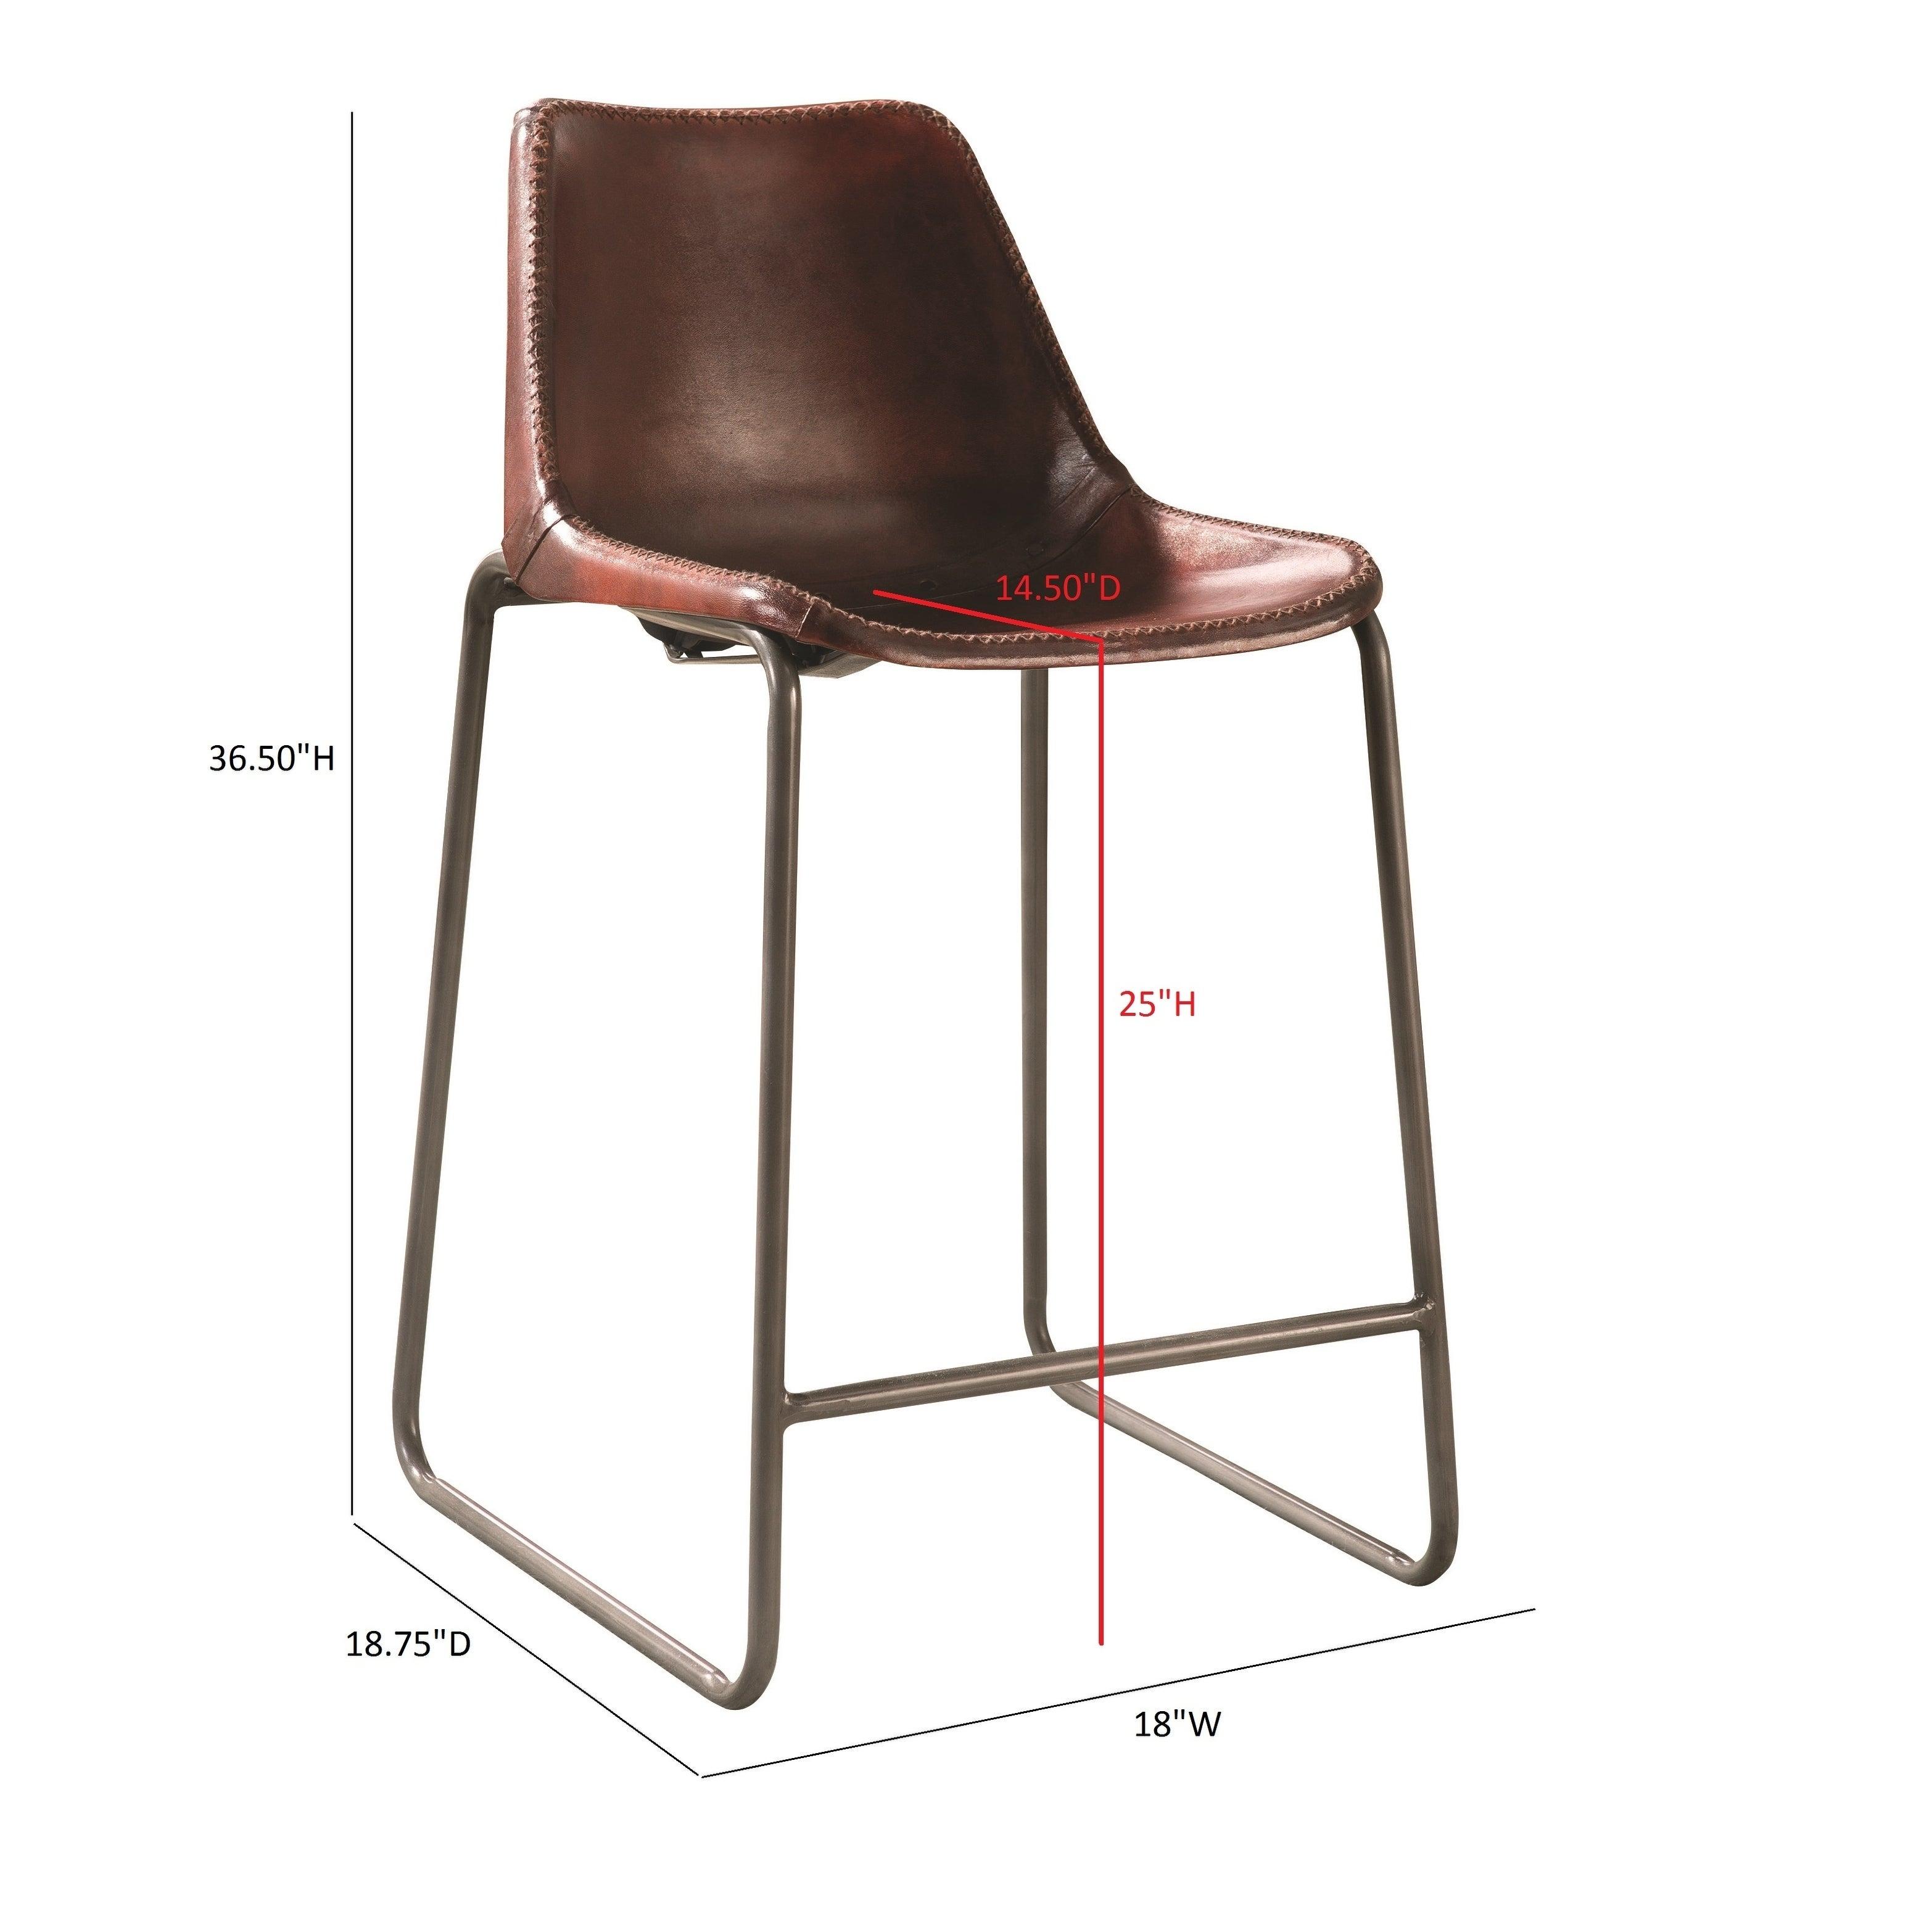 Groovy Antonelli Reddish Brown Counter Height Chair 18 X 18 75 X 36 50 Frankydiablos Diy Chair Ideas Frankydiabloscom